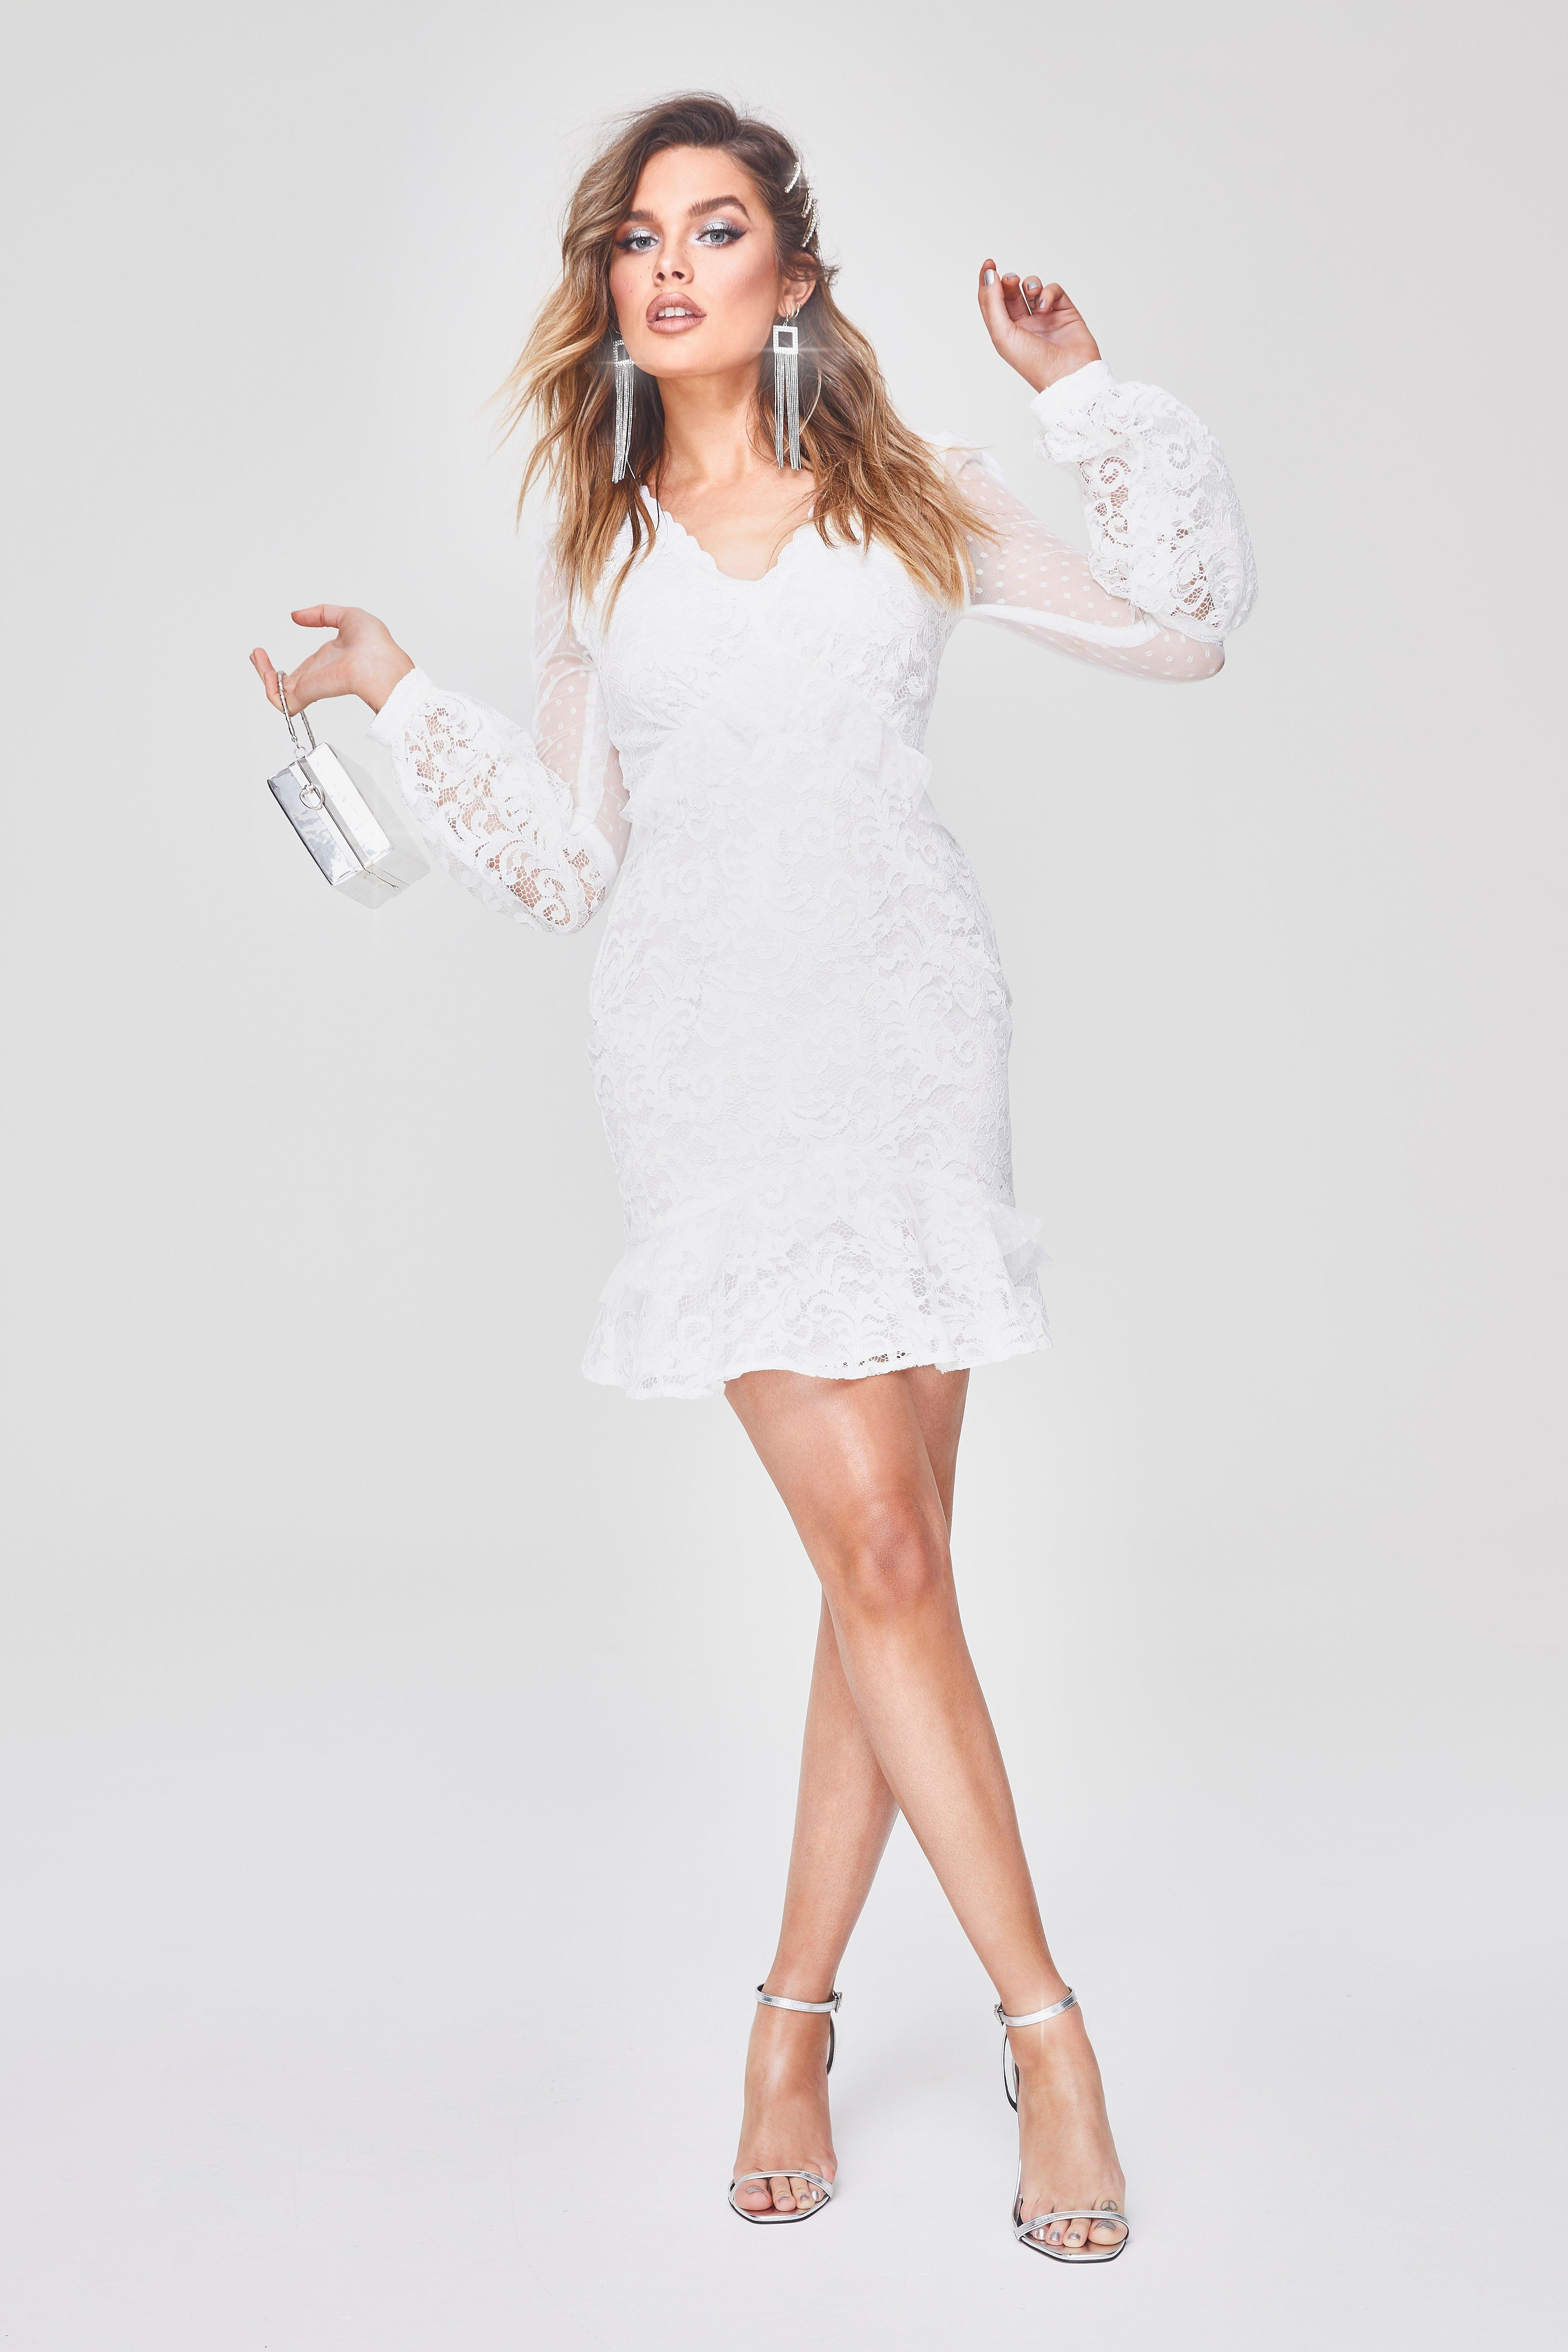 243567f3af88 Boohoo Premium Lace Chiffon Ruffle Mini Dress in White - Lyst